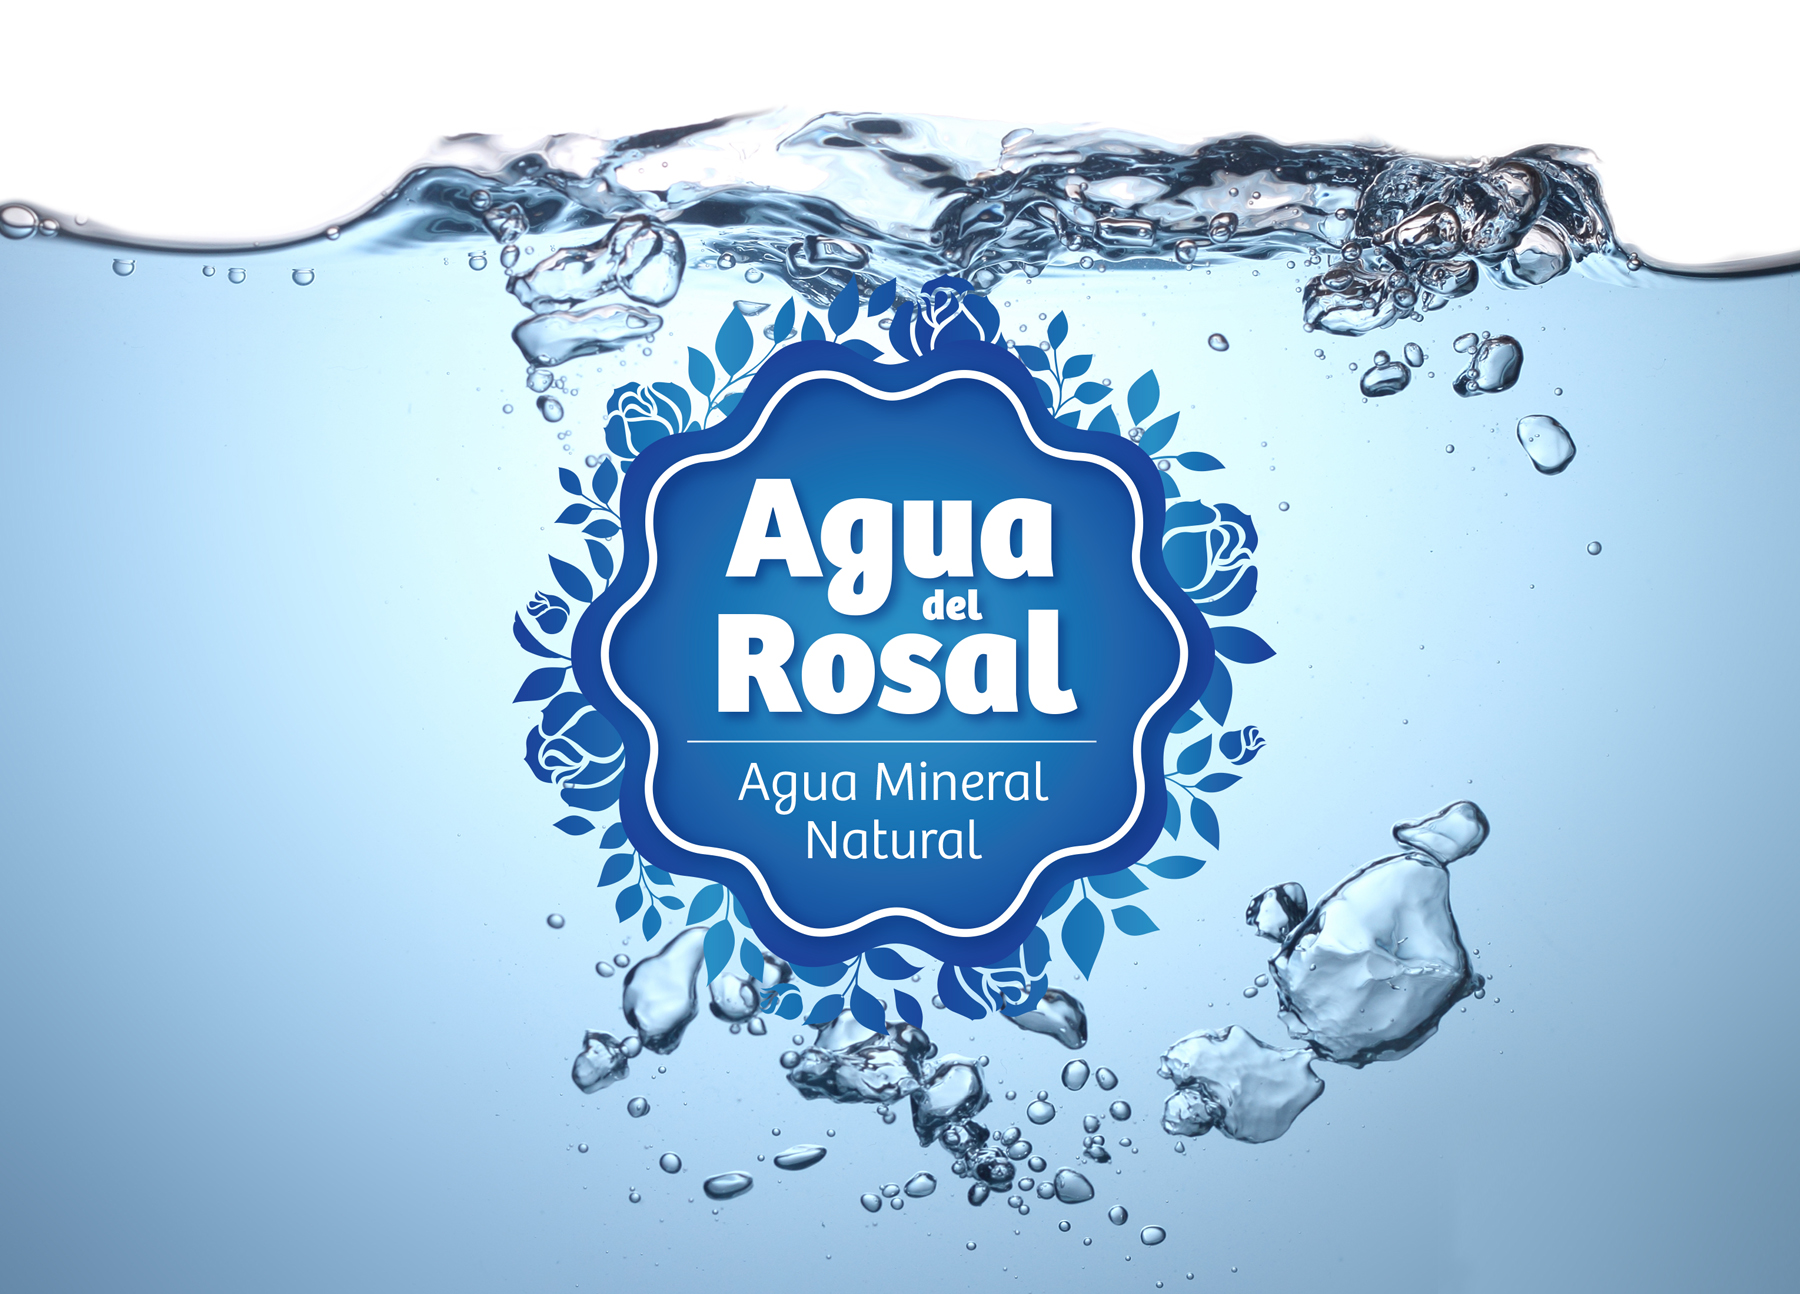 04 Agua del Rosal. Branding